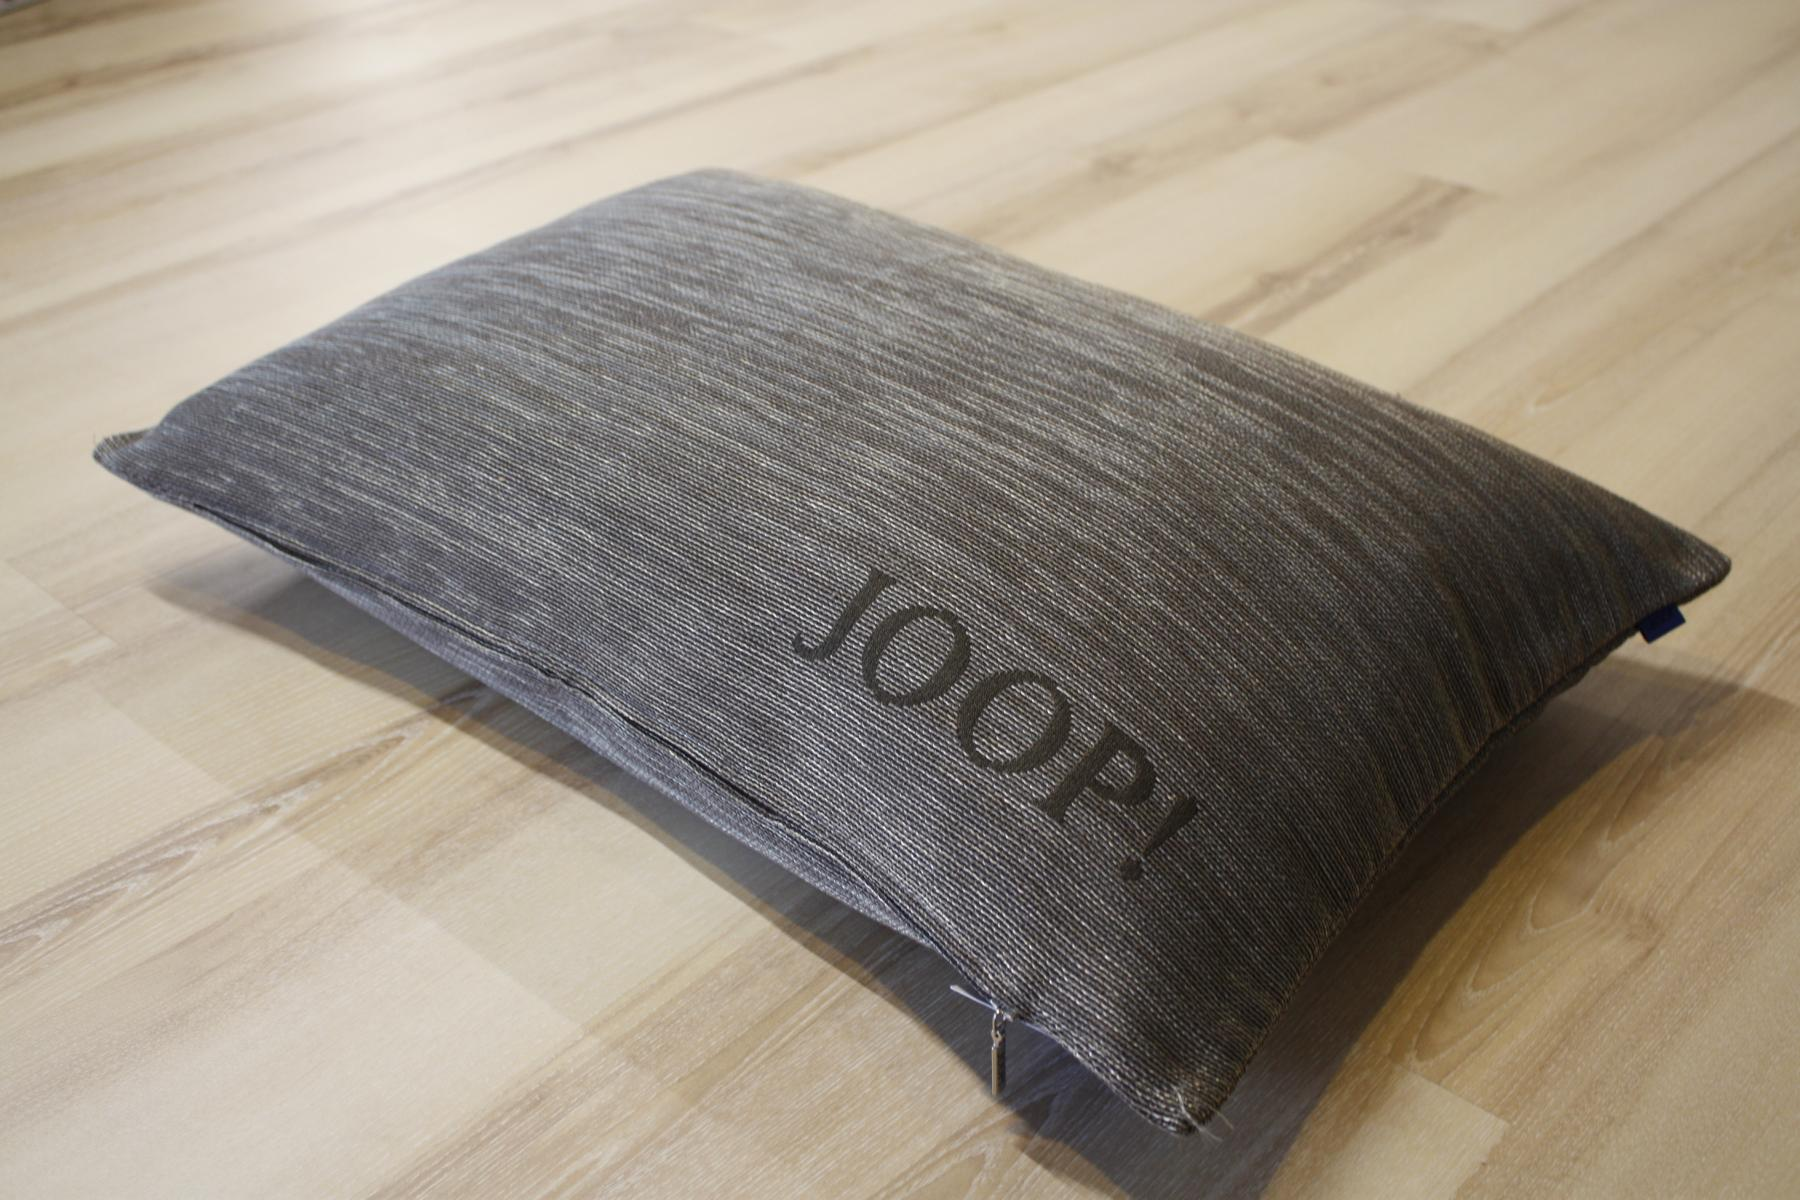 joop kissen premium 010 kitt 40x60 cm inkl federf llung ebay. Black Bedroom Furniture Sets. Home Design Ideas